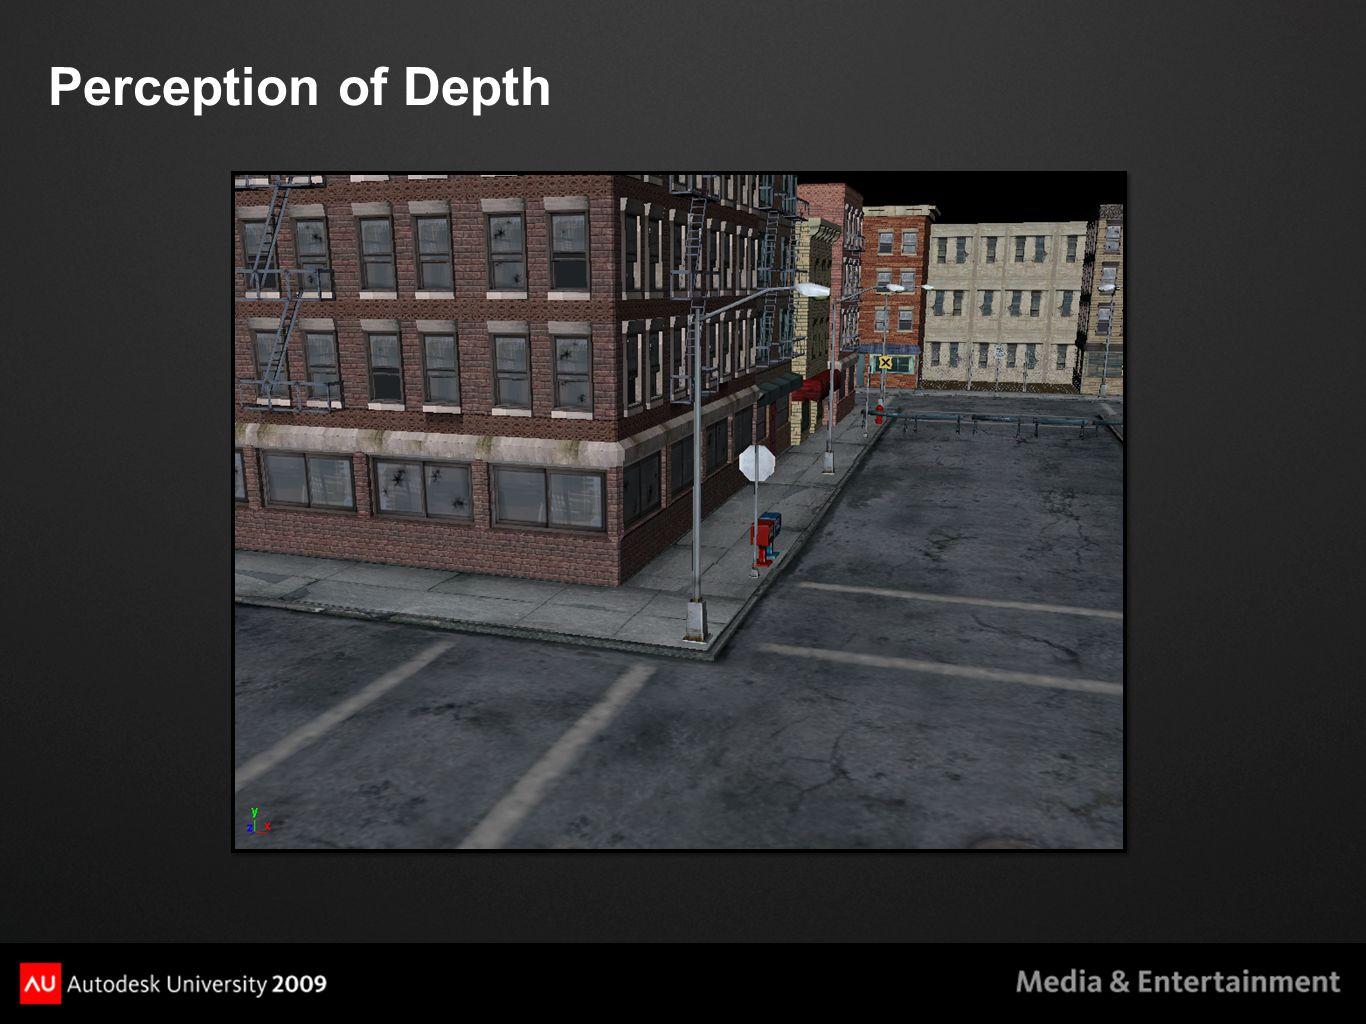 Perception of Depth